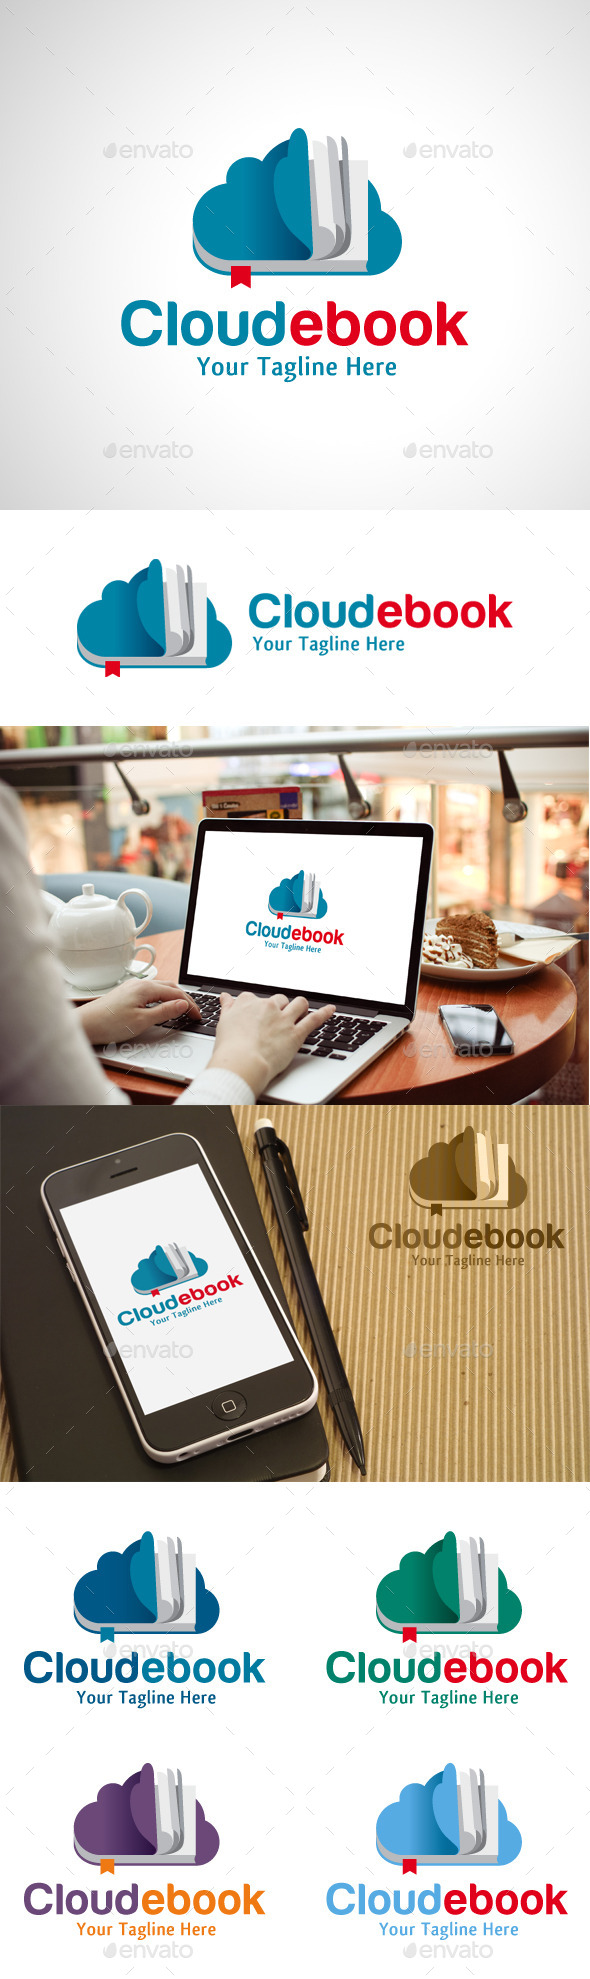 Cloud Ebook Logo - Objects Logo Templates